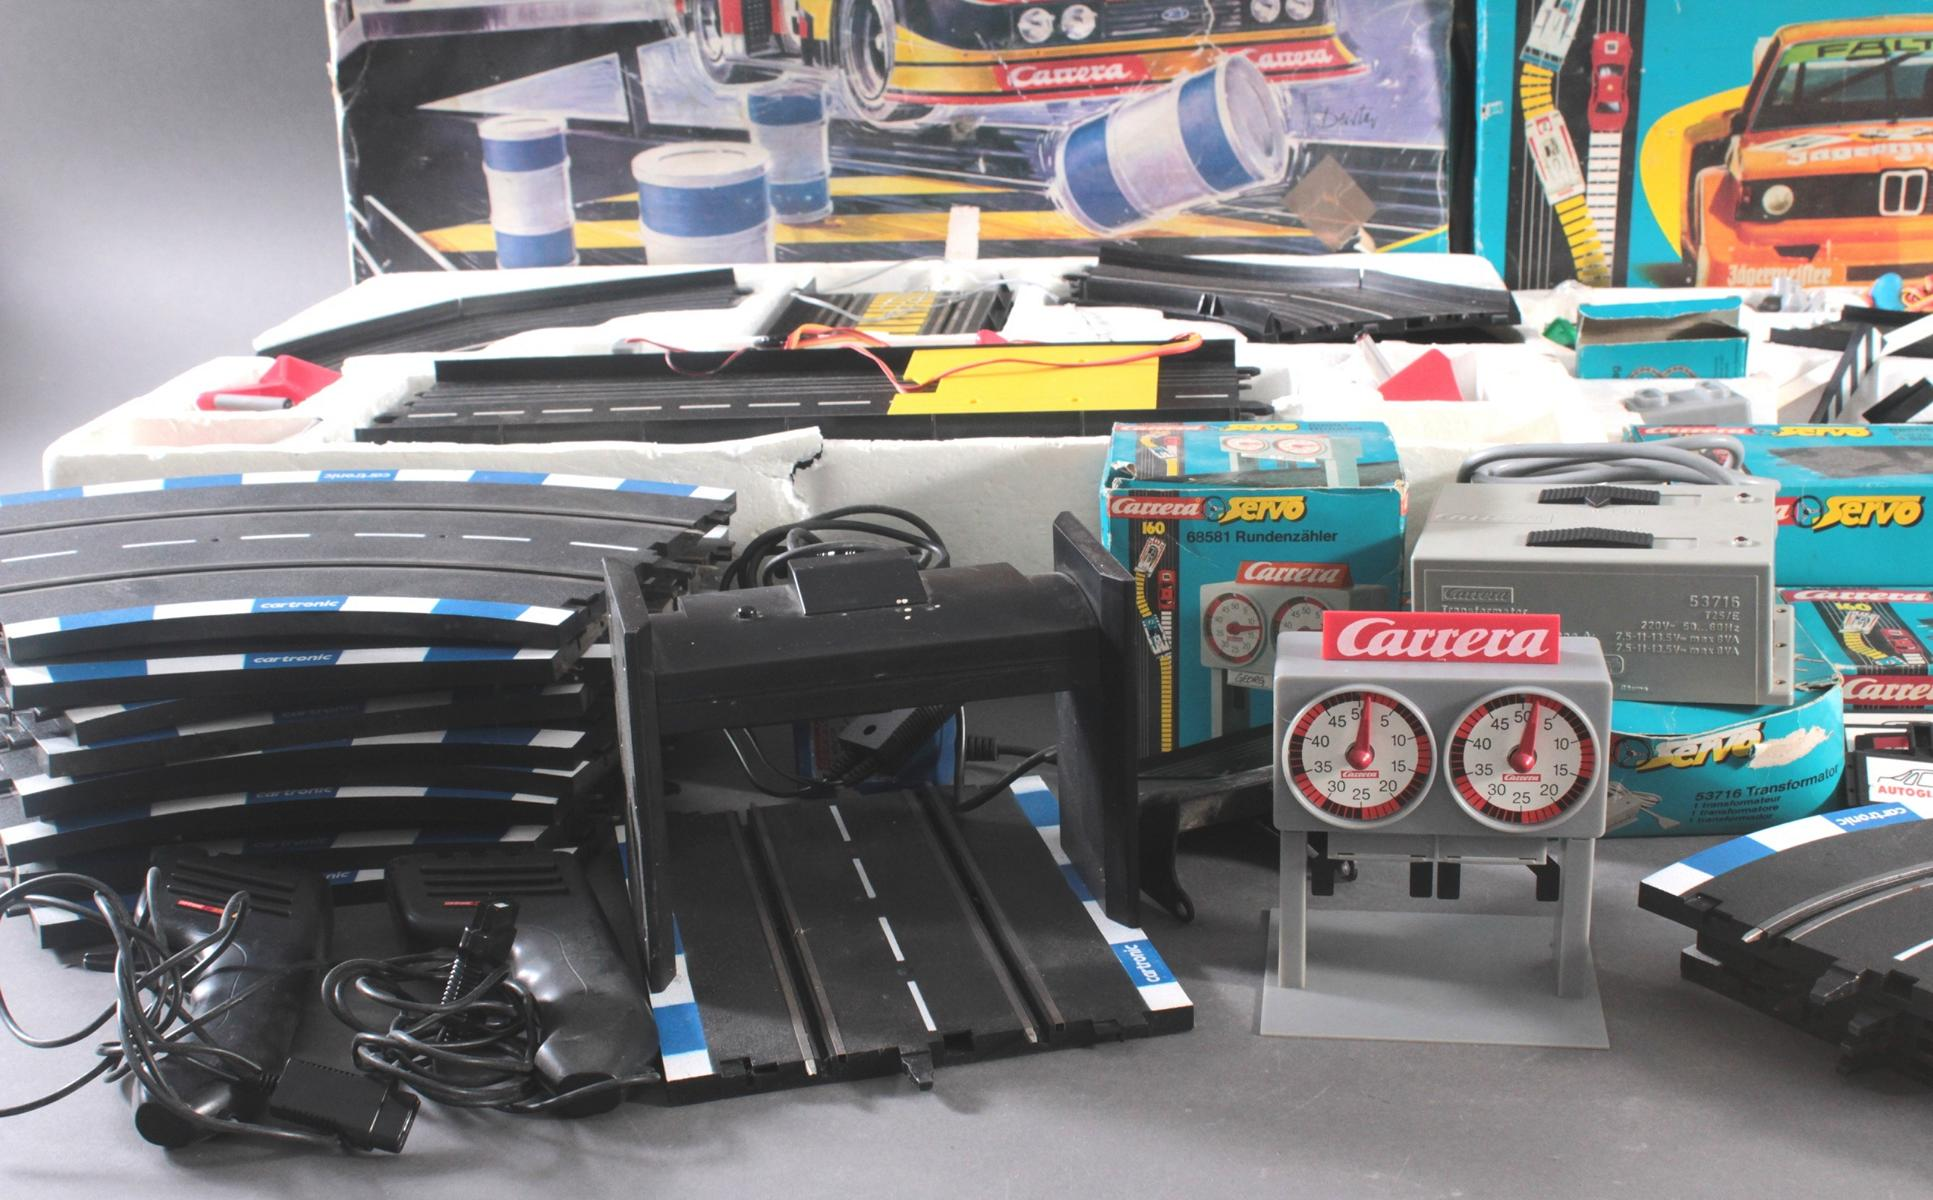 Konvolut Carrera Autorennbahn-2